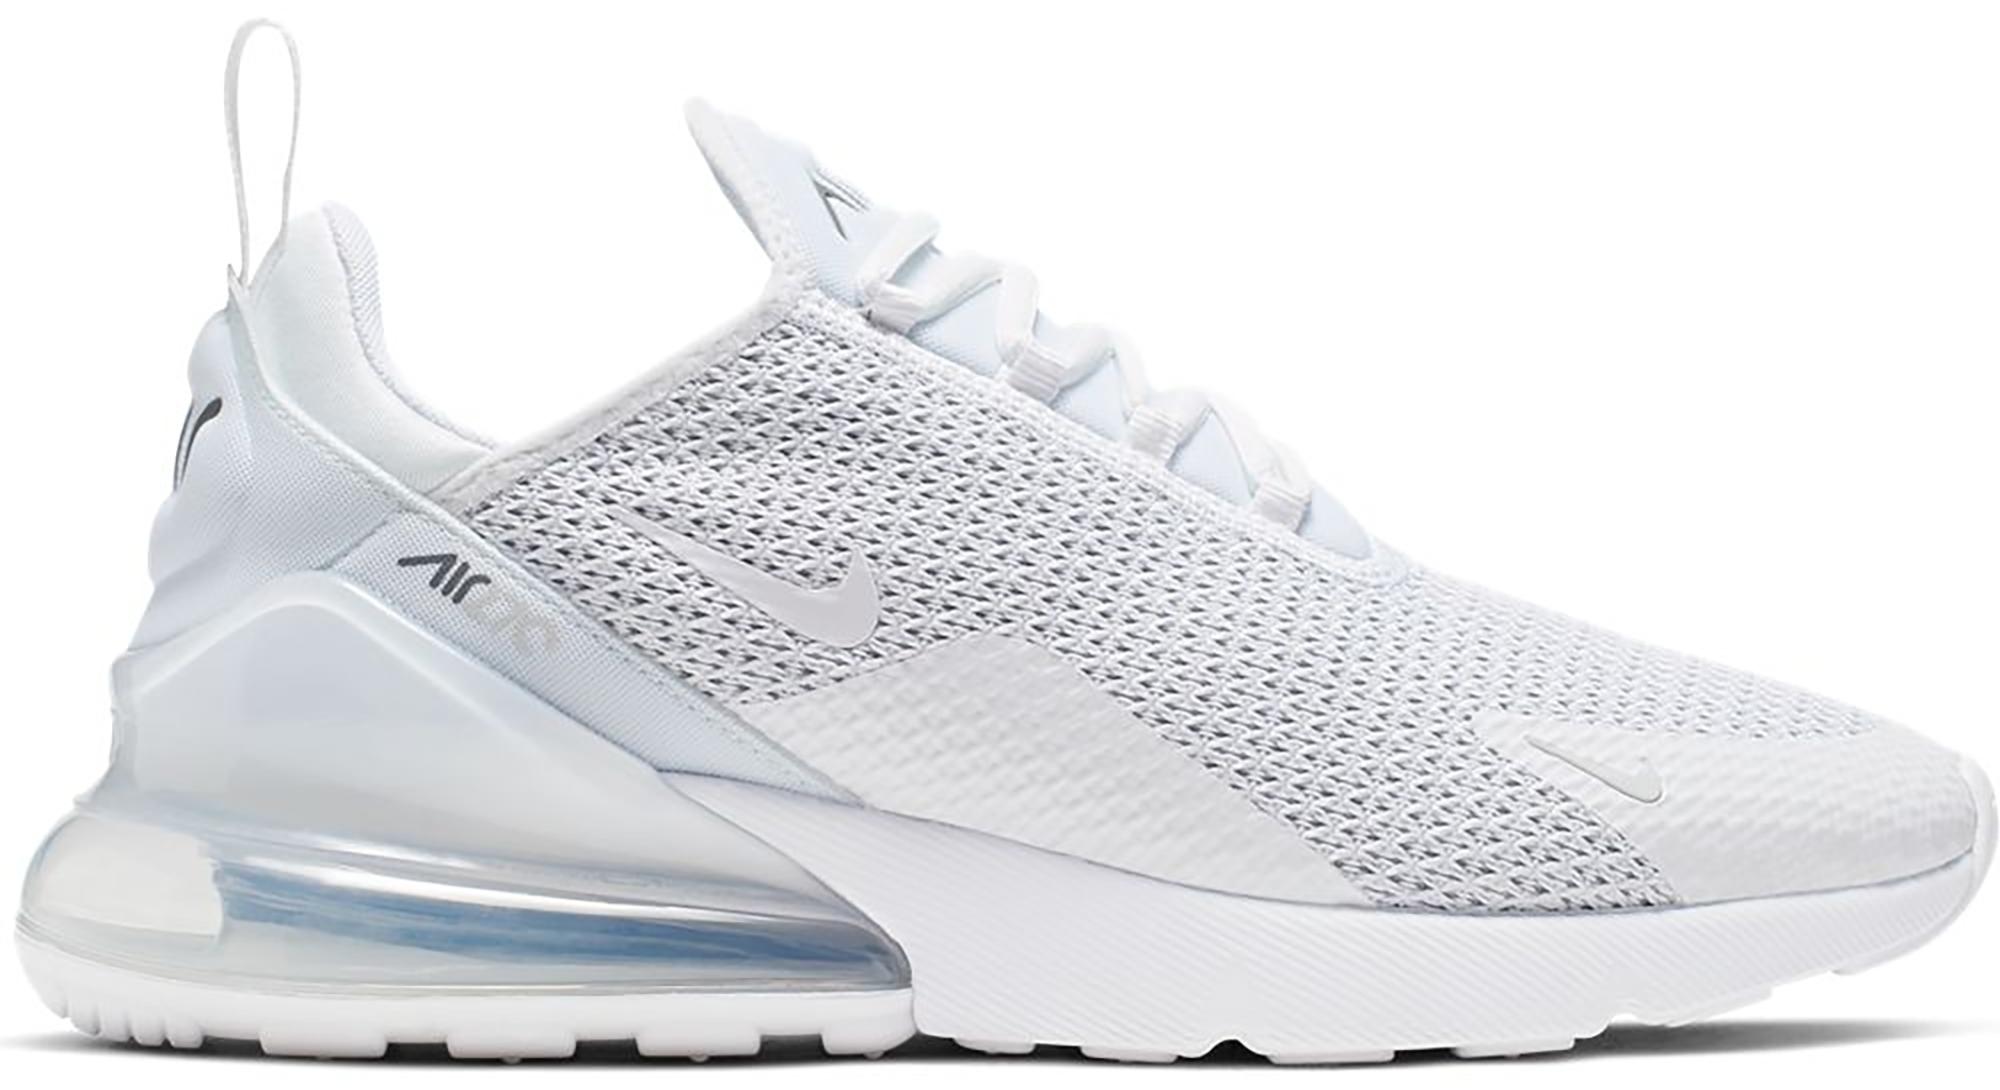 Nike Air Max 270 White Pure Platinum